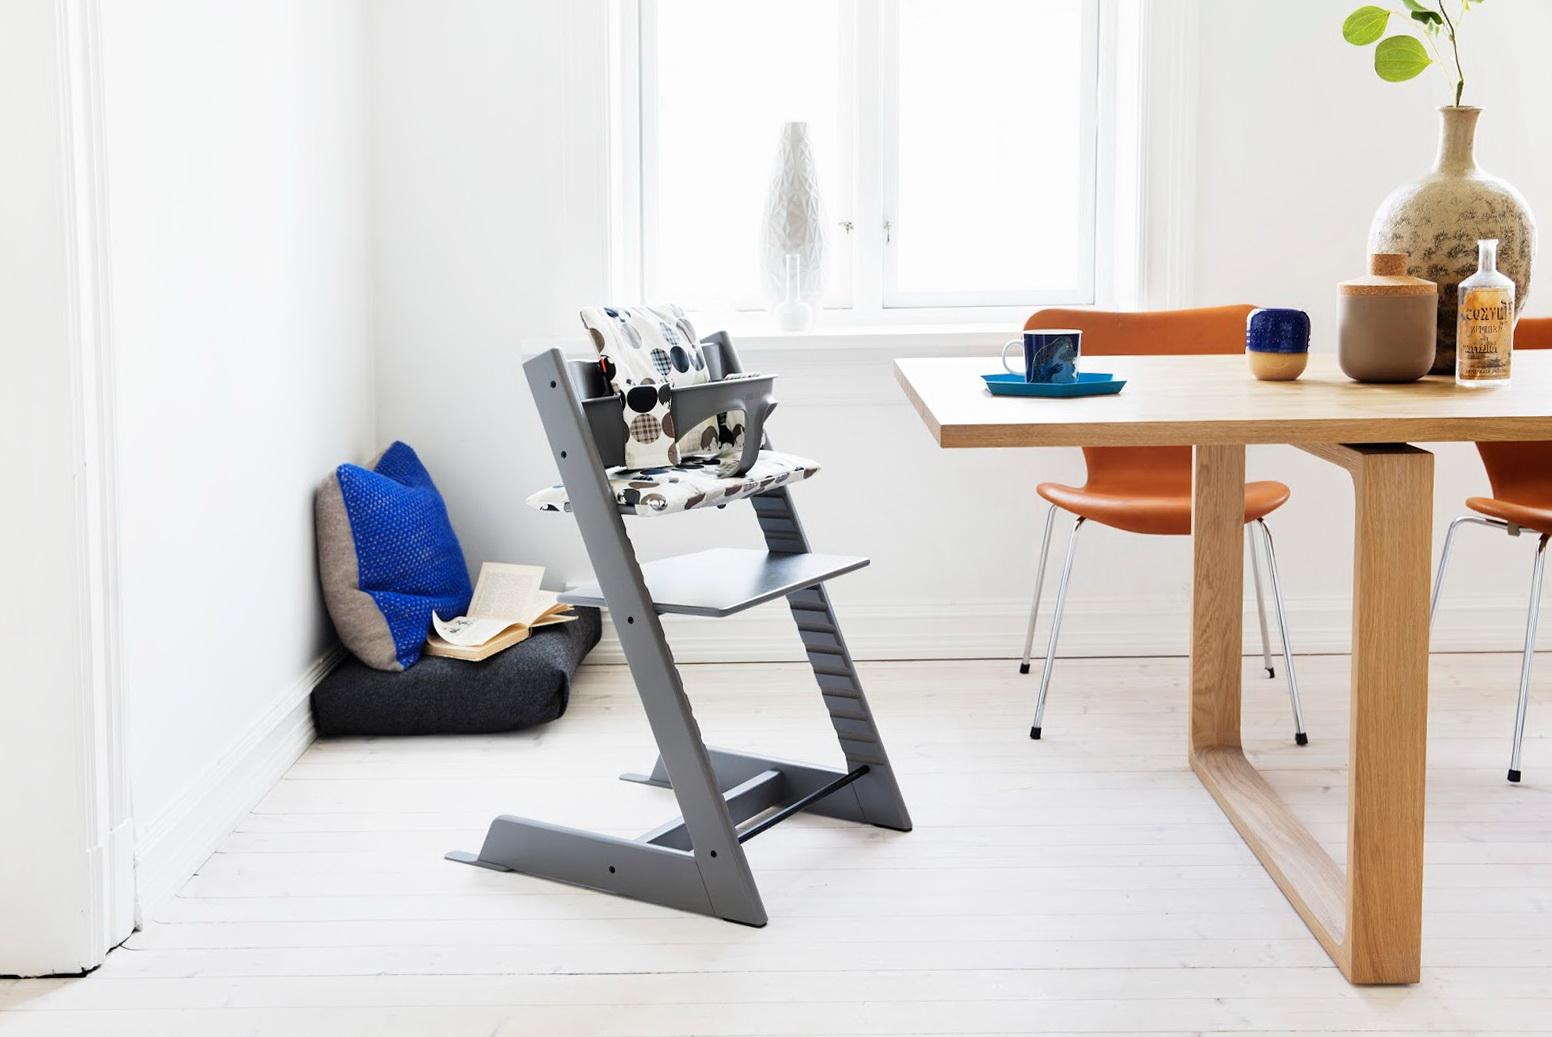 Stokke Tripp Trapp Cushion Amazon Home Design Ideas